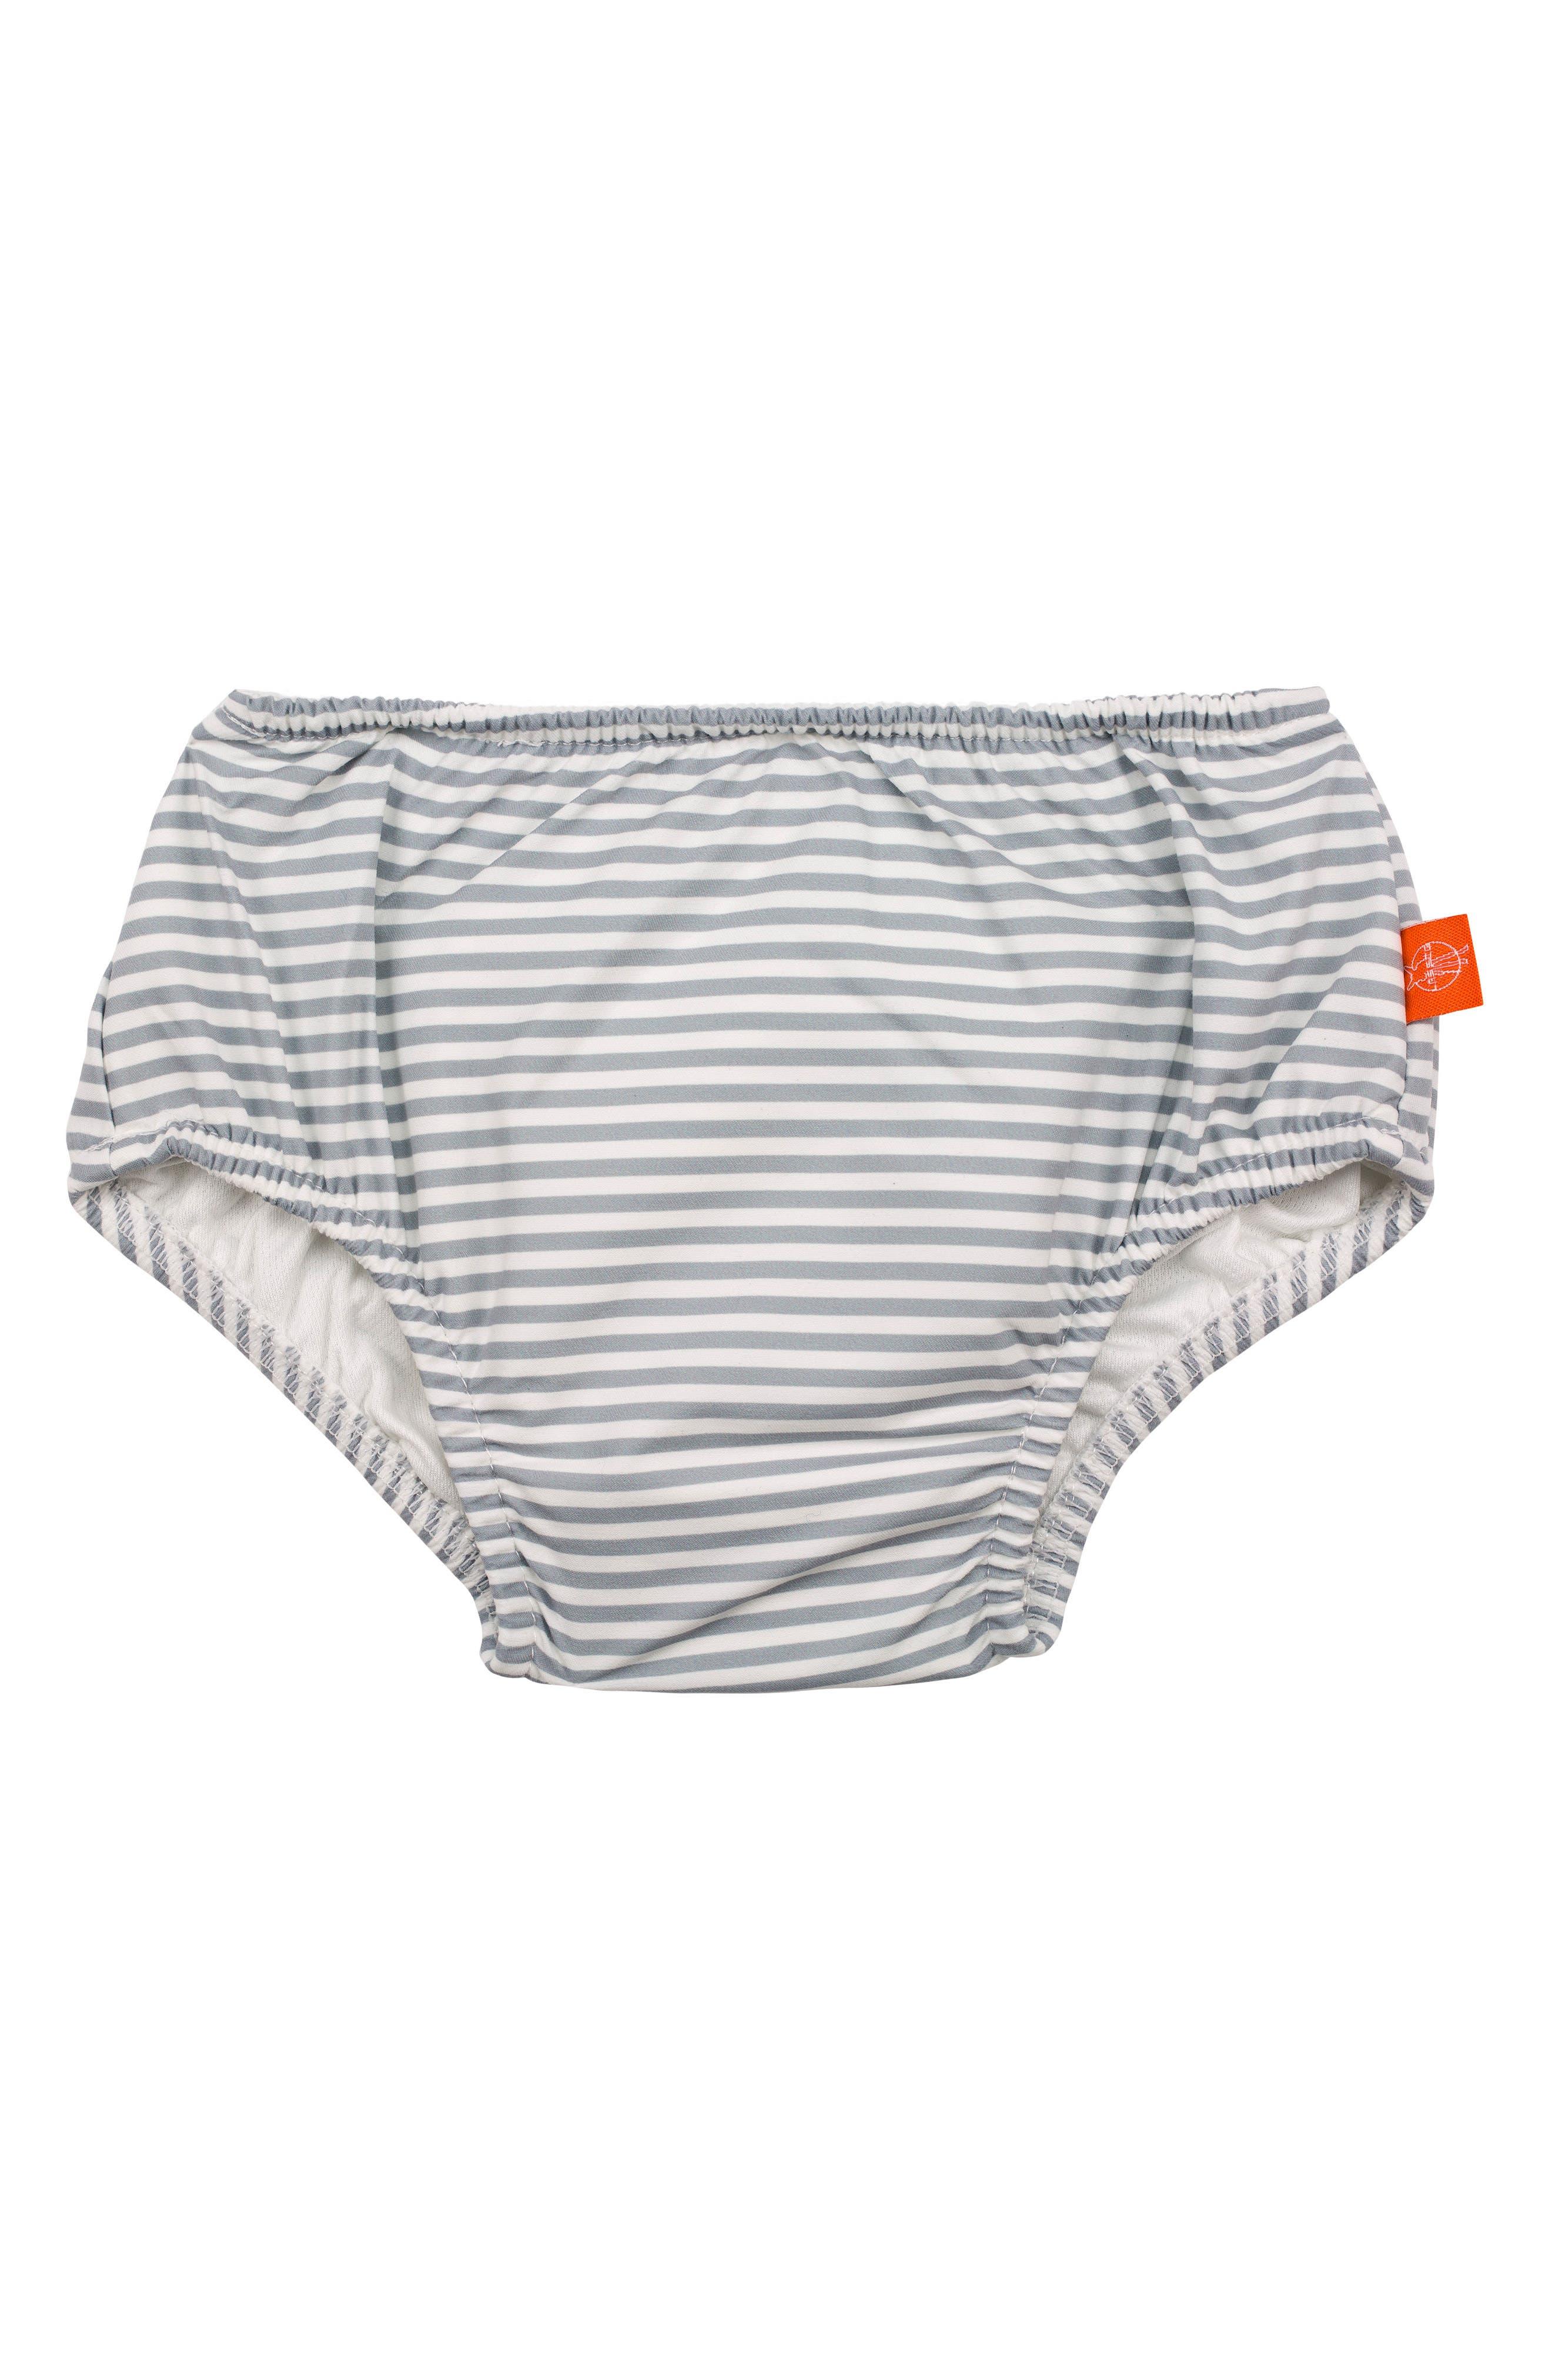 Submarine Swim Diaper Cover,                             Main thumbnail 1, color,                             Grey Orange